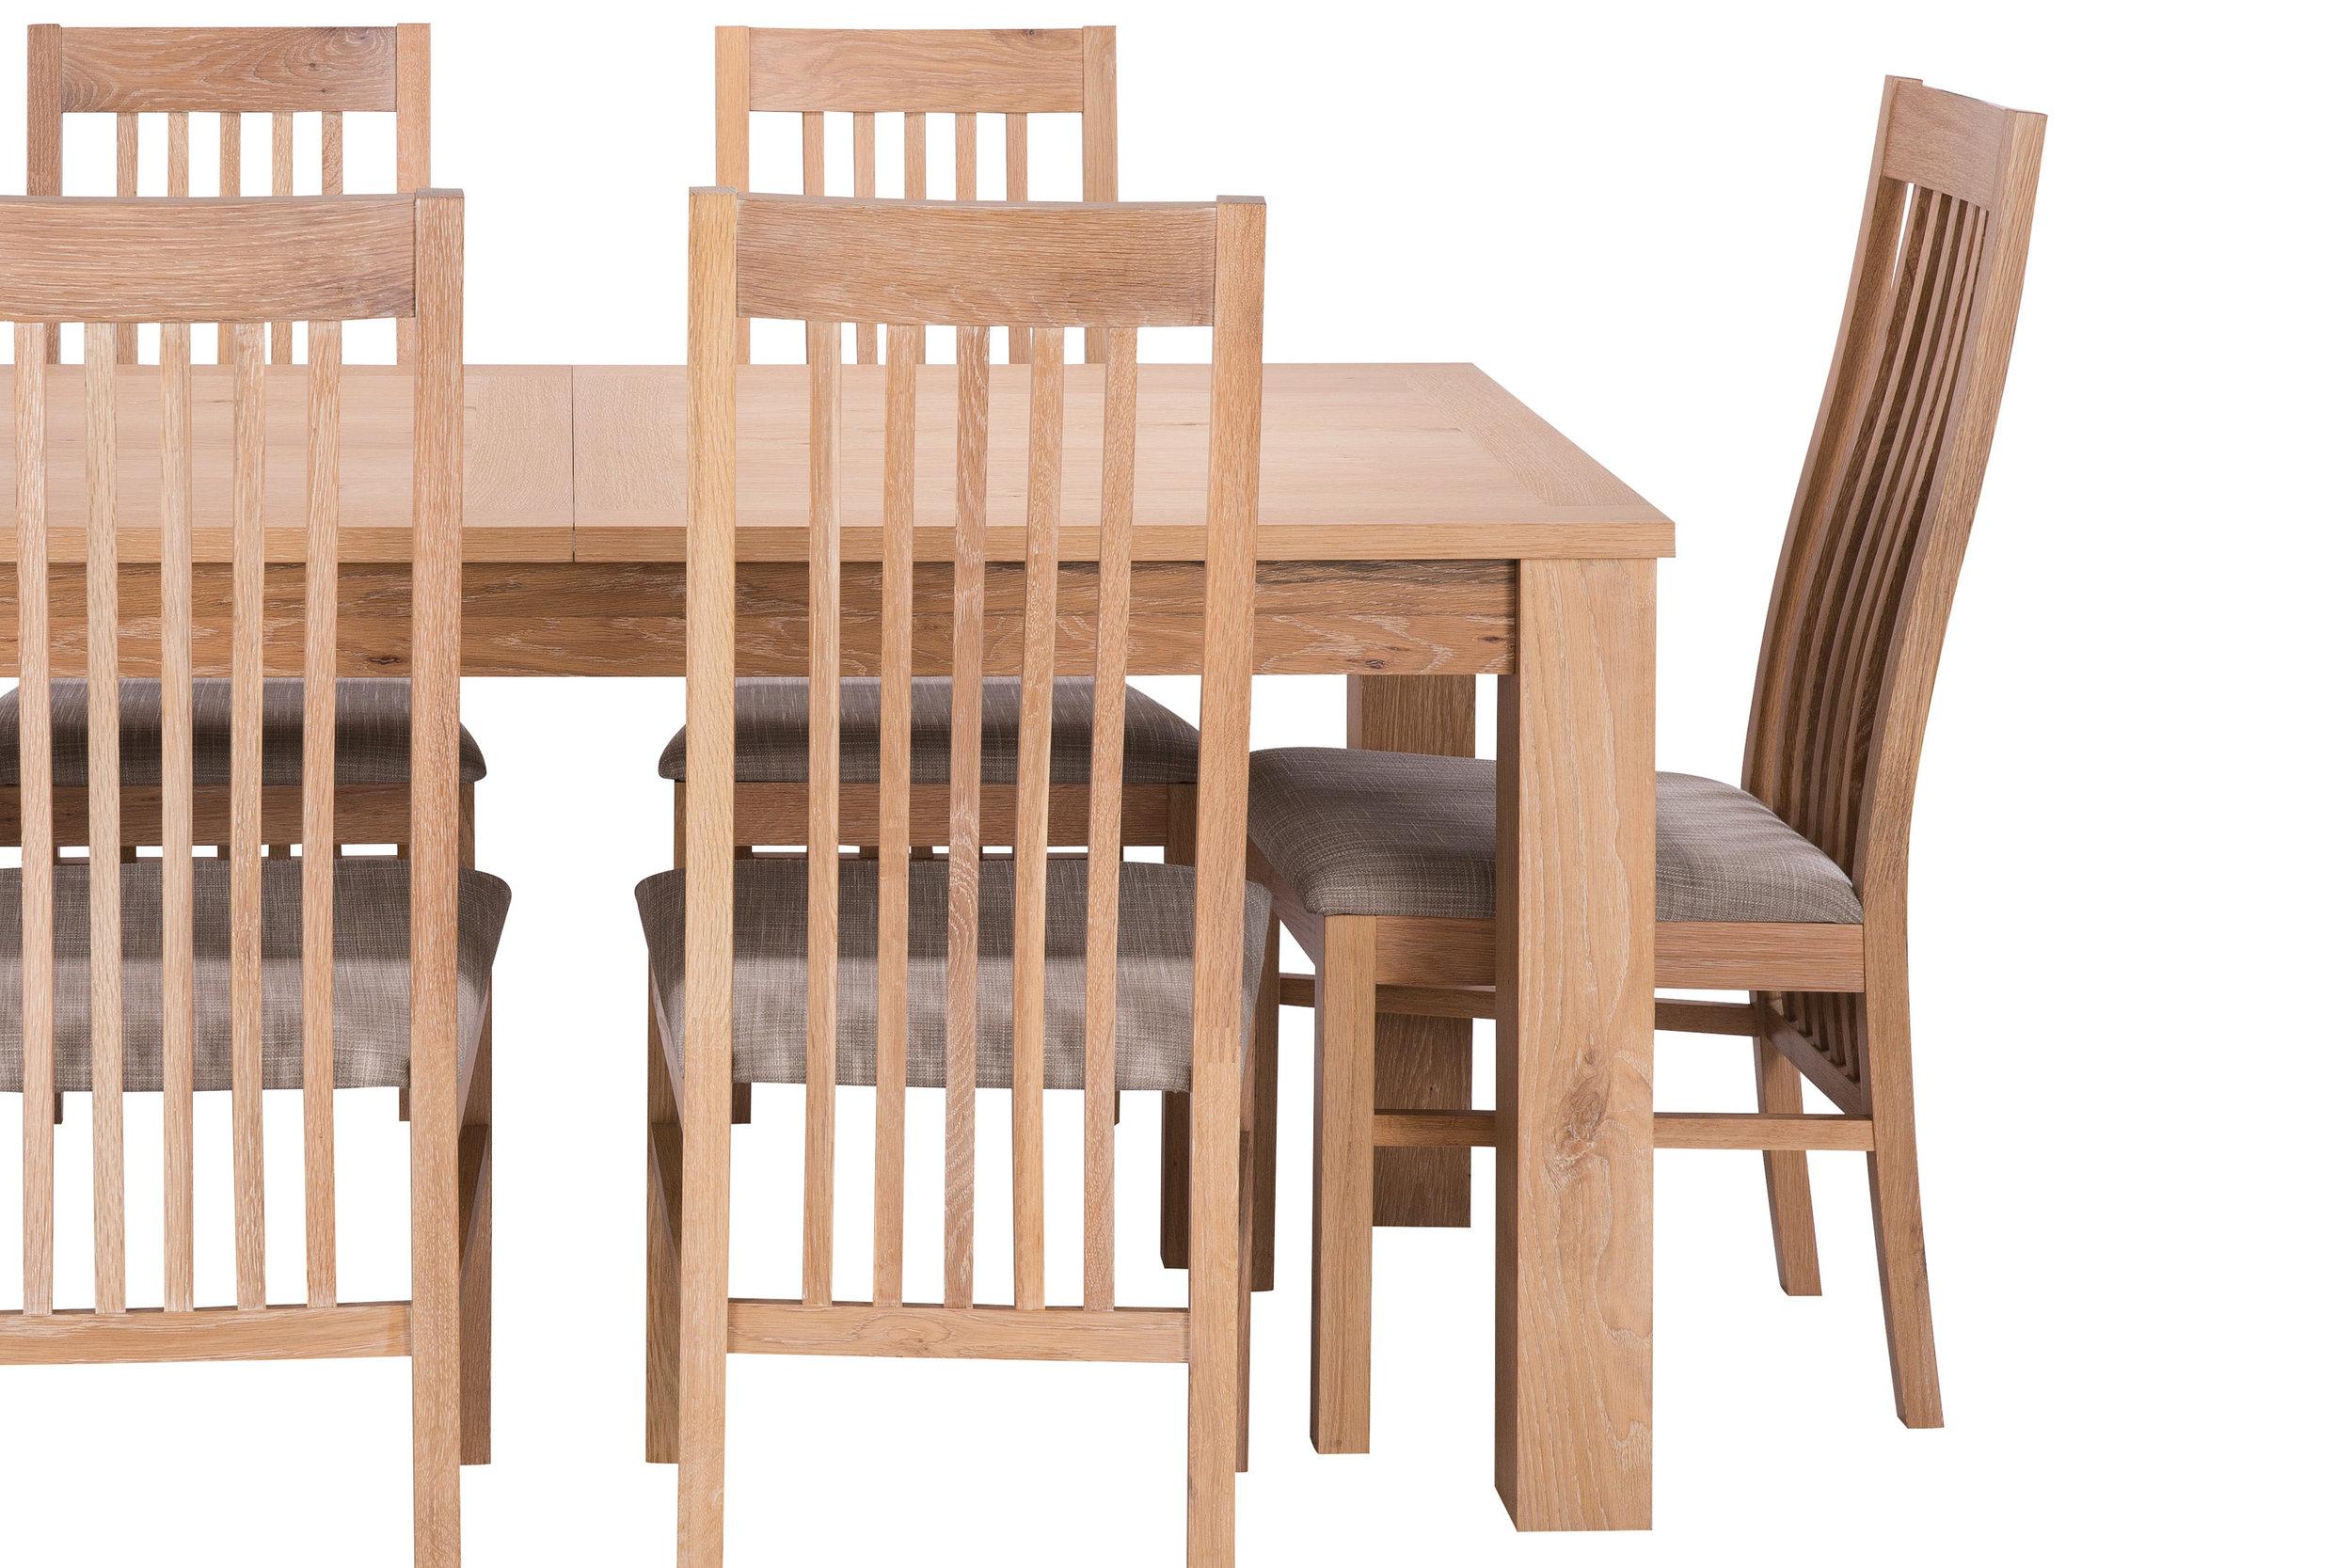 Simple_Furniture_product_TBP_4.jpg